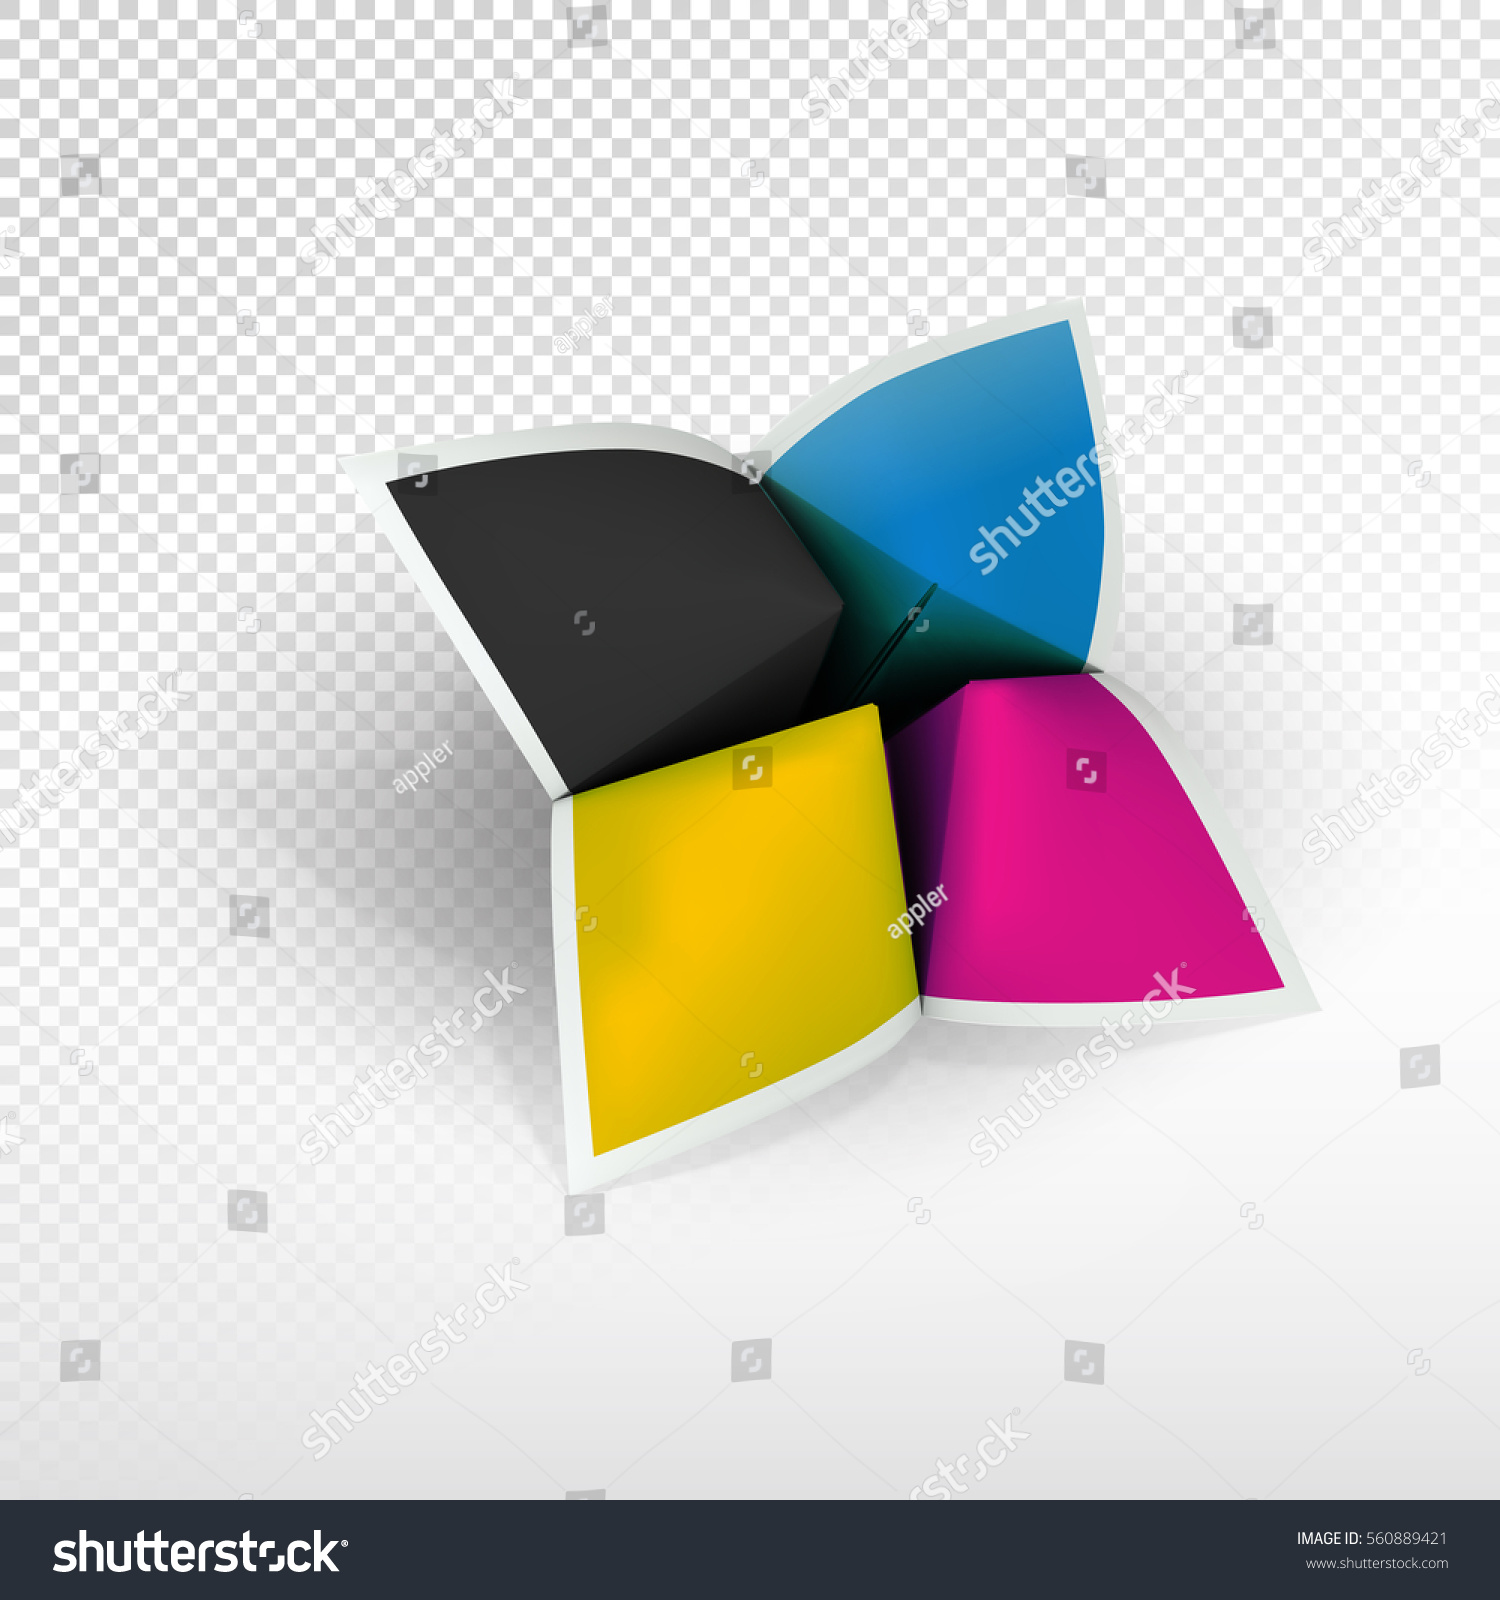 Design Teller fortune teller cmyk colors poligraphy emblem stock vector 560889421